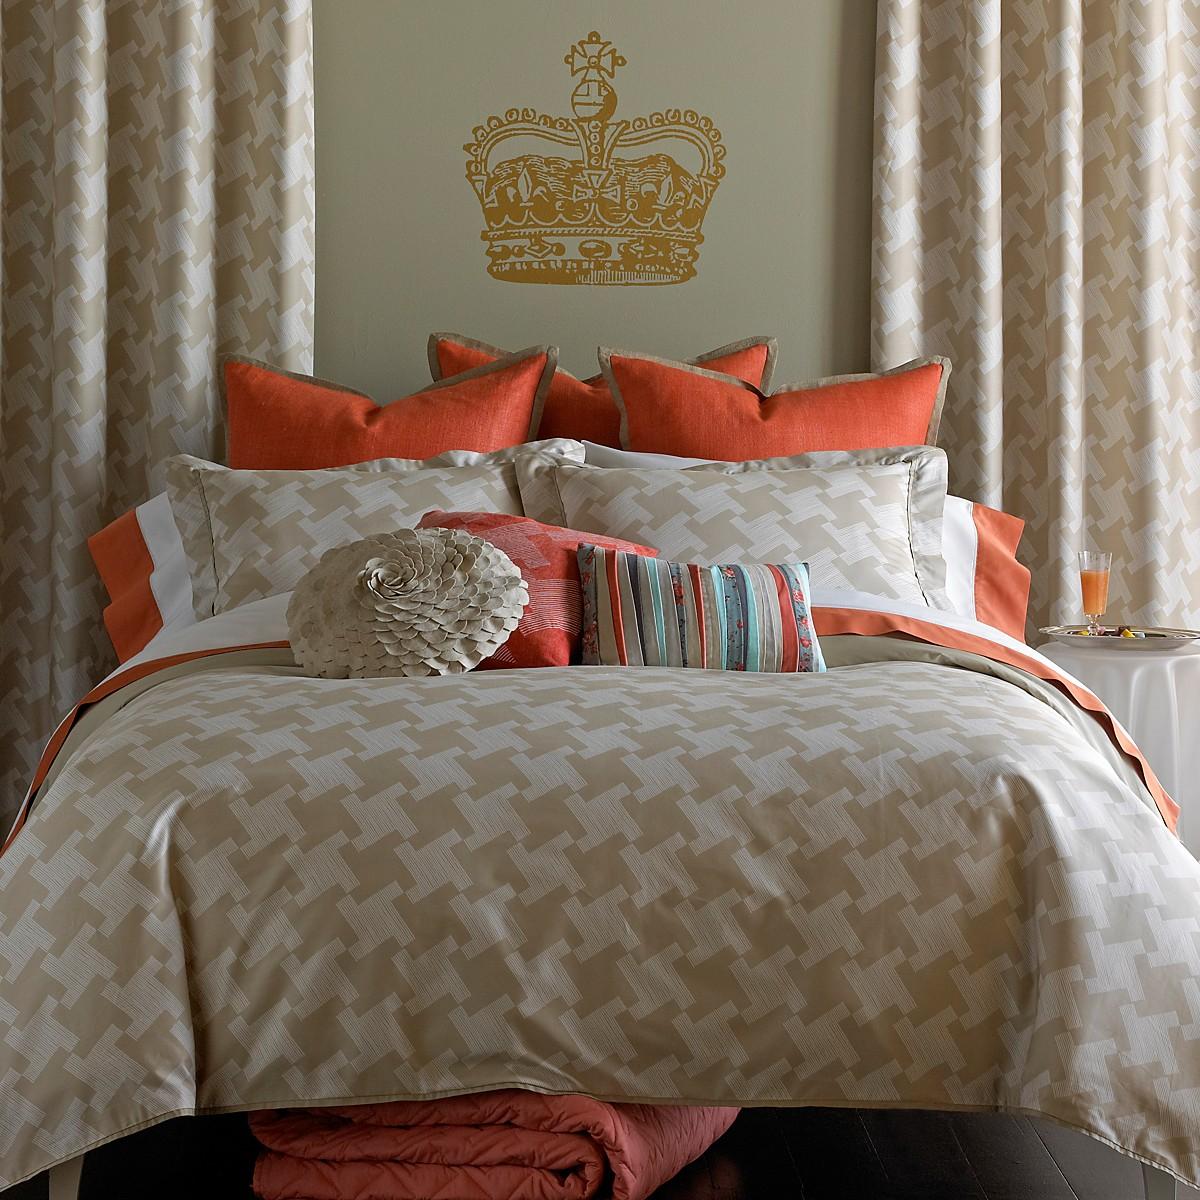 Blissliving Home: In Honour Of The Queenu0027s Jubilee!